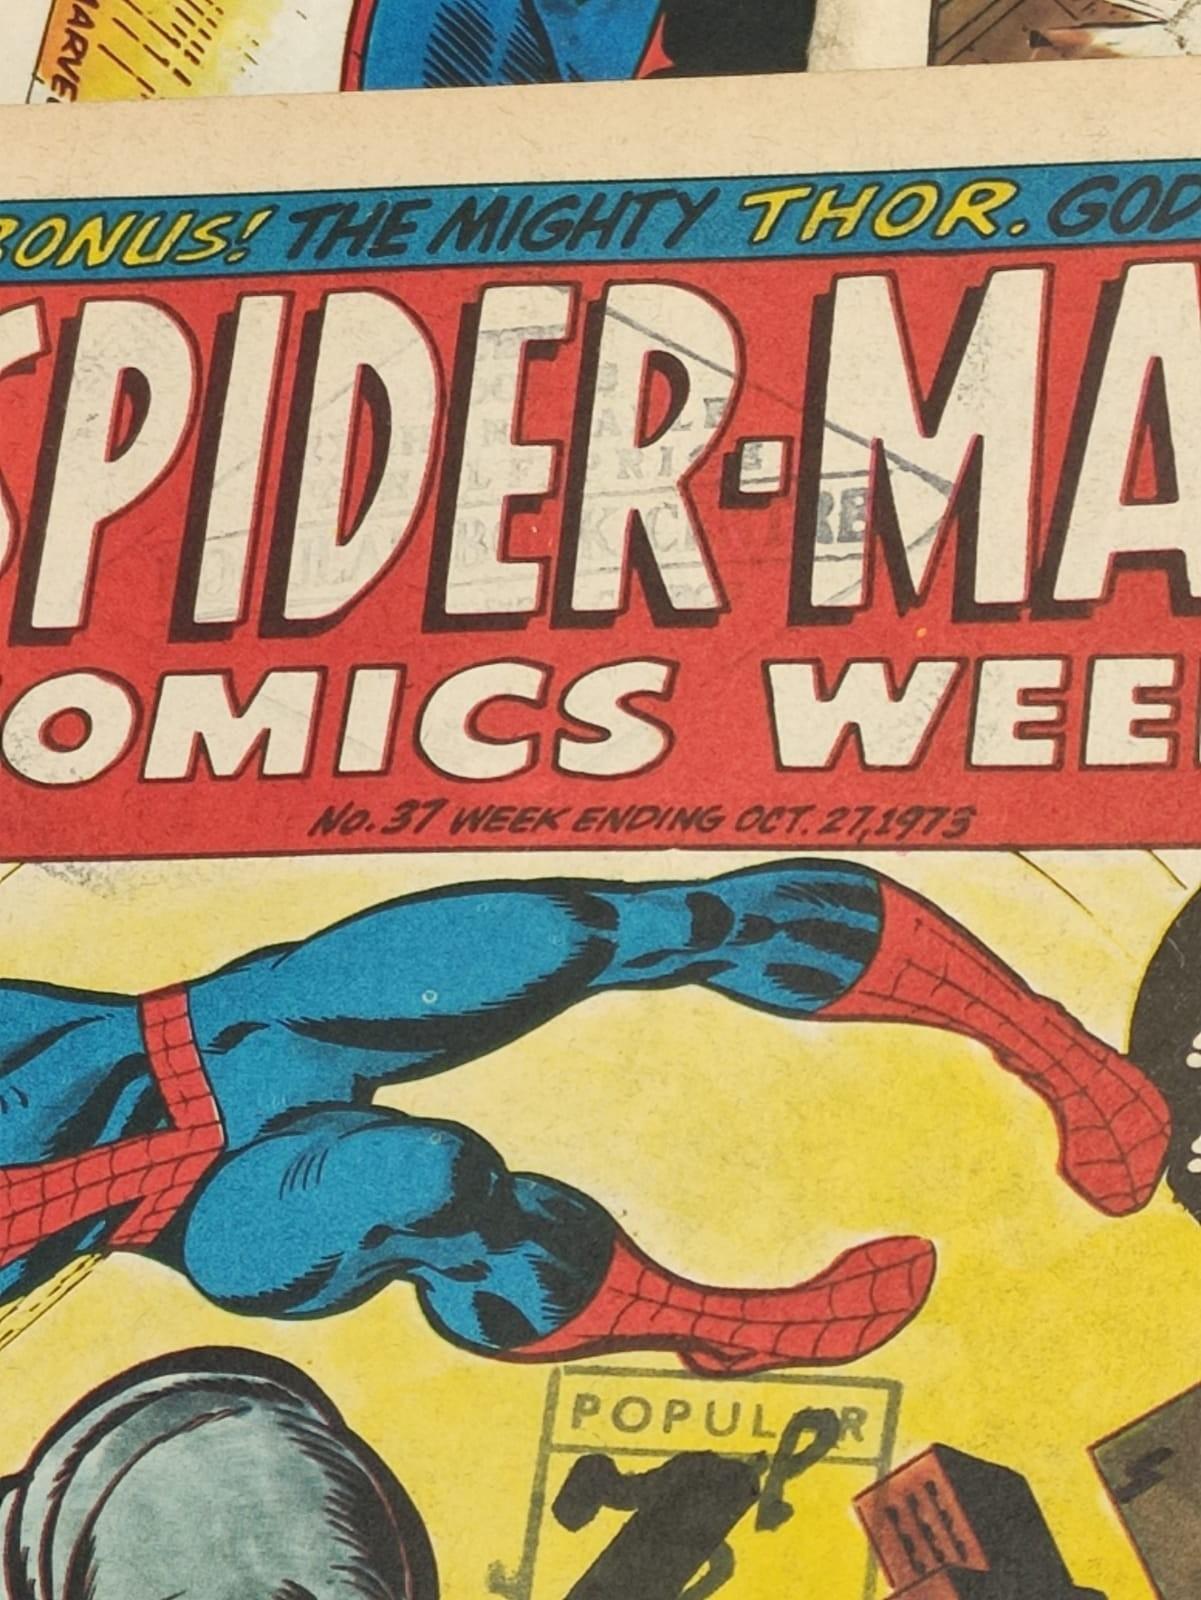 6 x Marvel comics. 1973 Spider-Man comics weekly. - Image 7 of 13